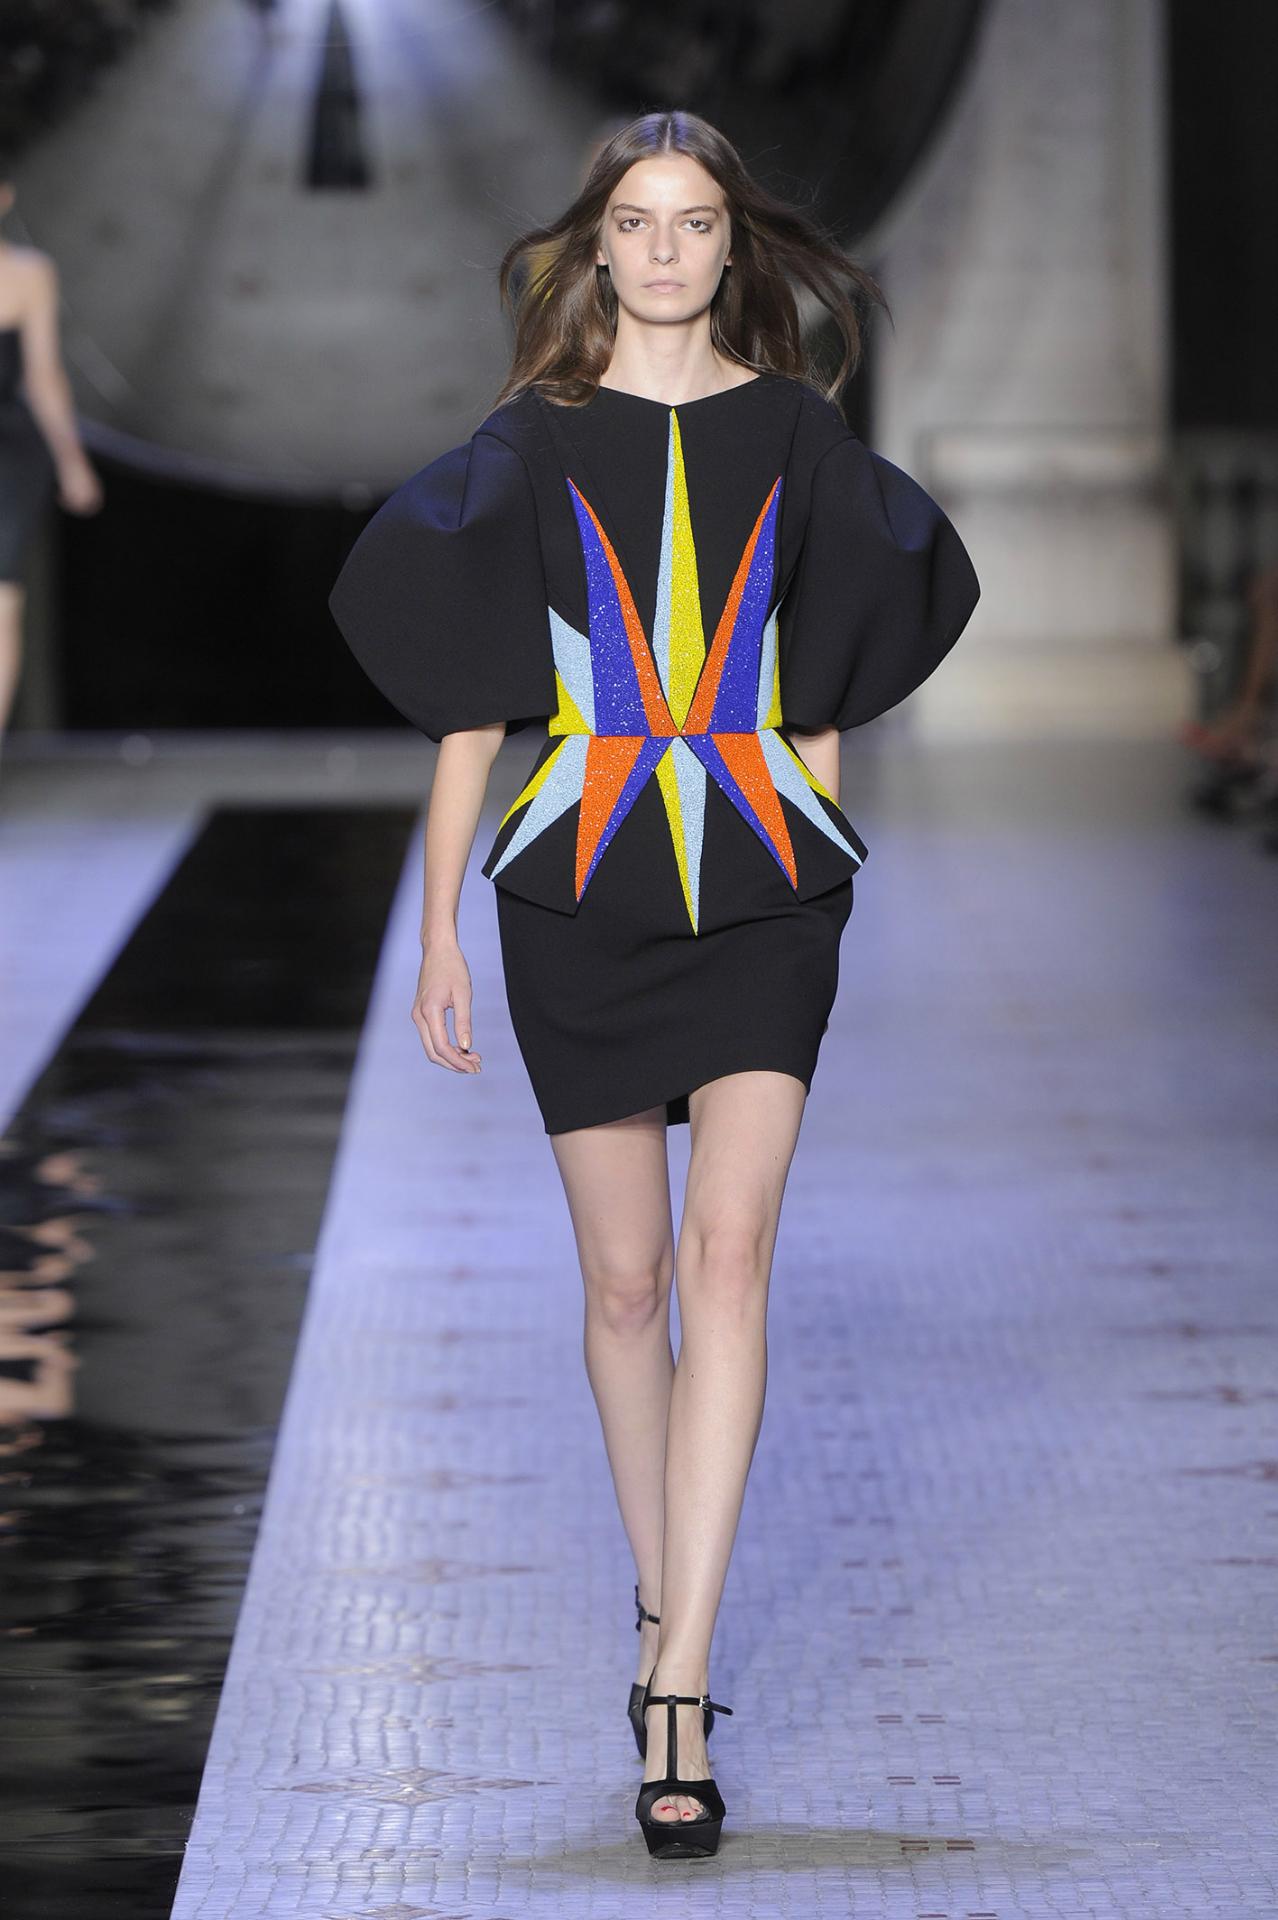 2015 Sonbahar/Kış Couture